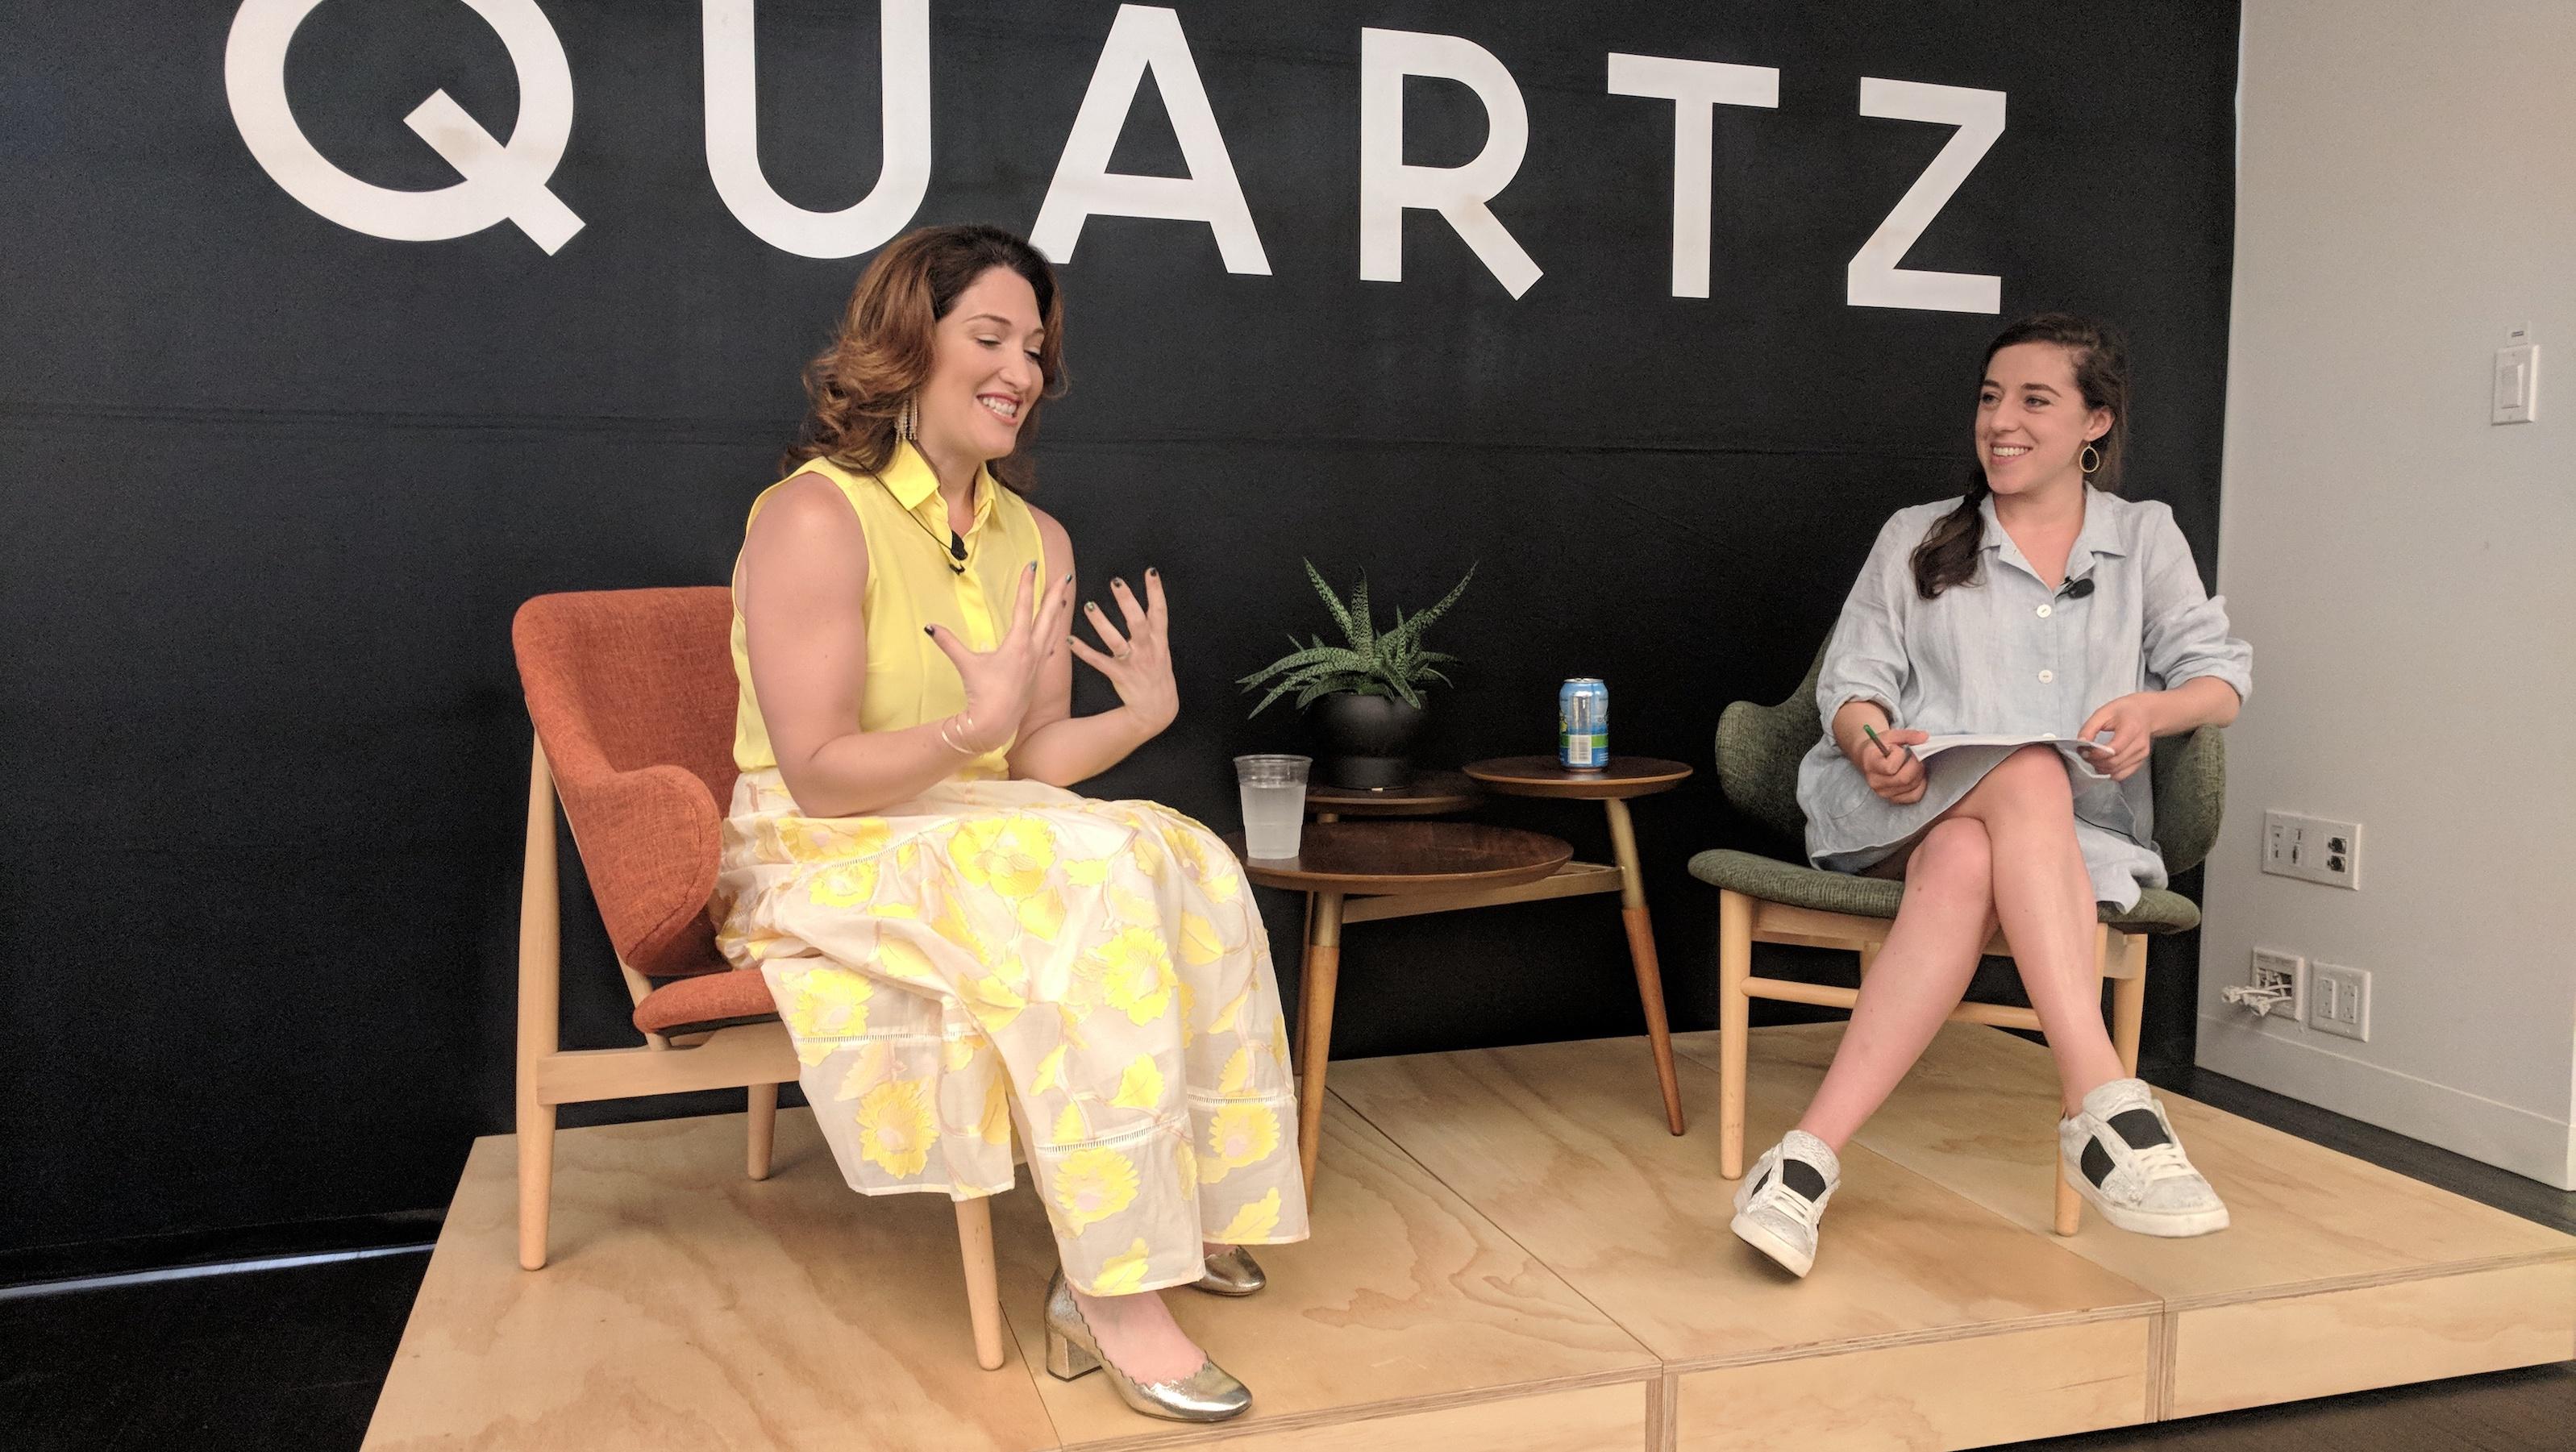 Randi Zuckerberg, left, likes fields with a fair chance for women.